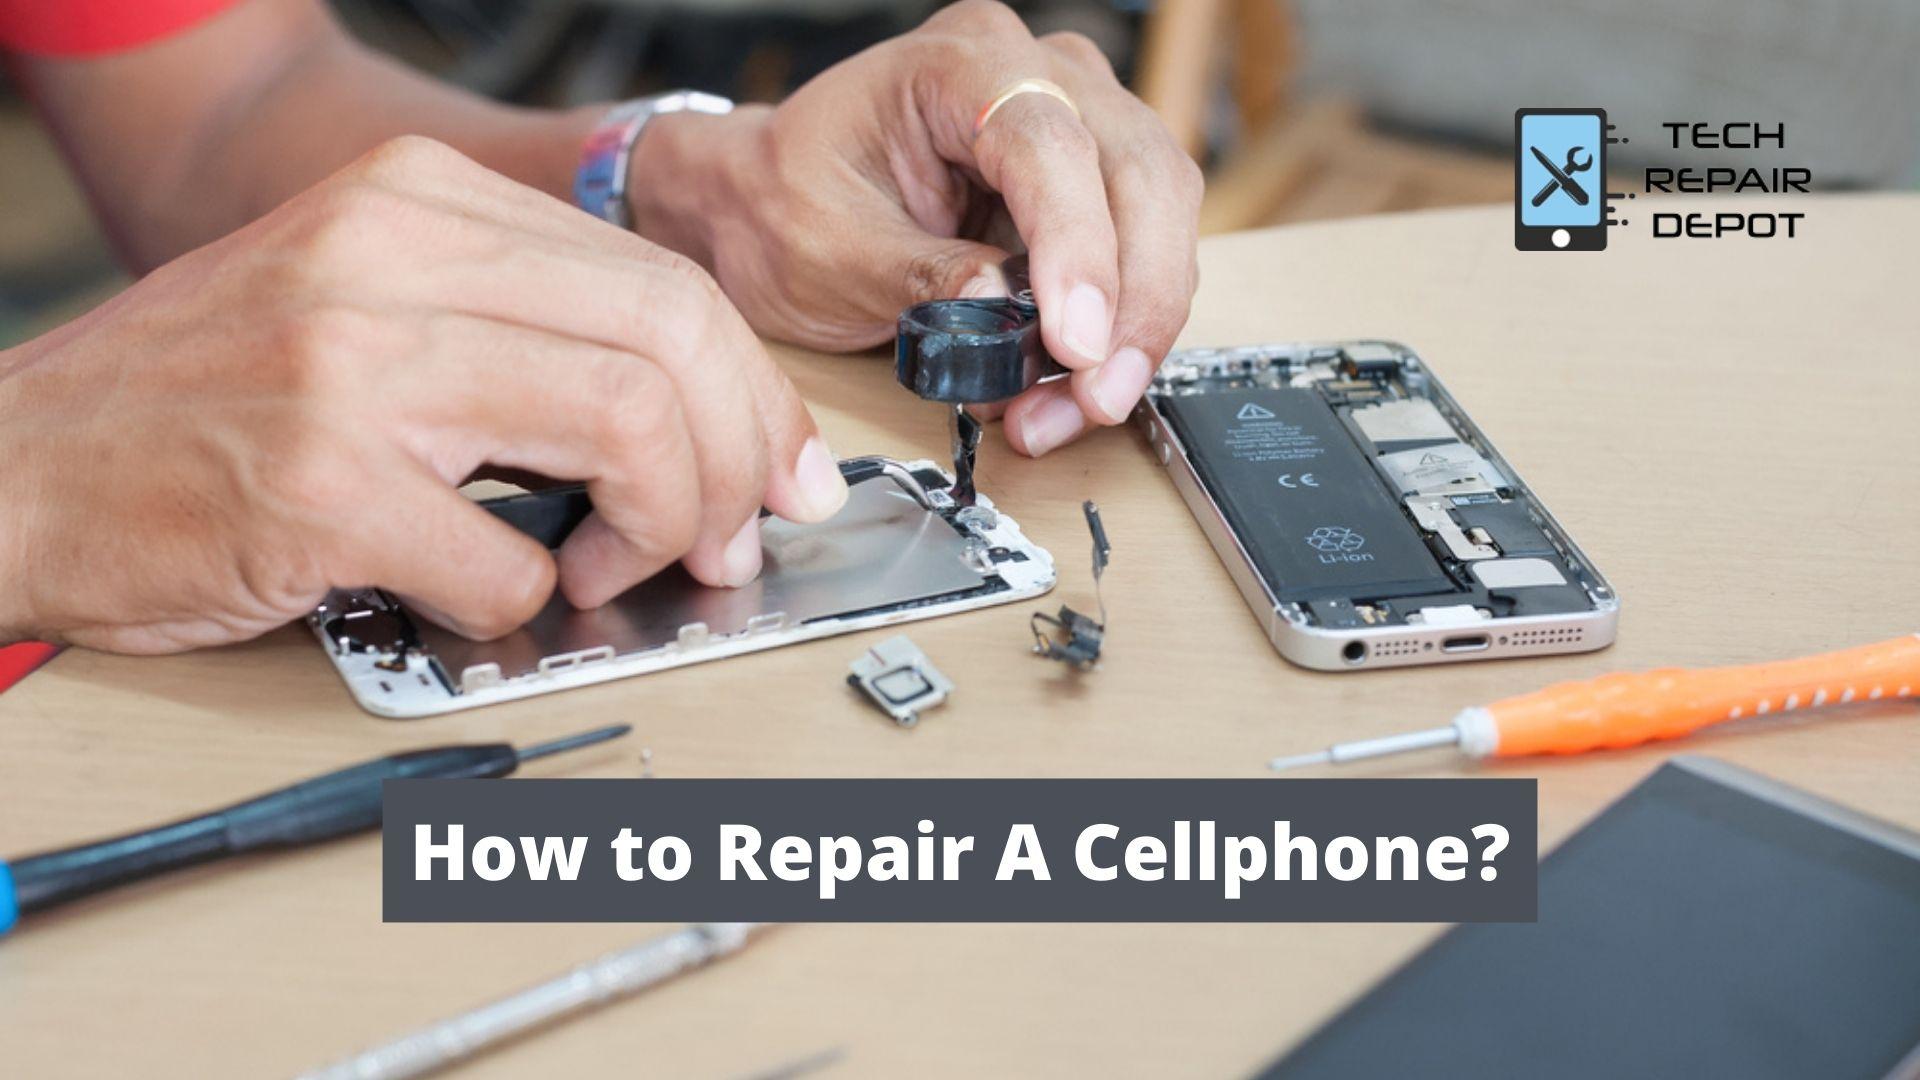 How to Repair A Cellphone